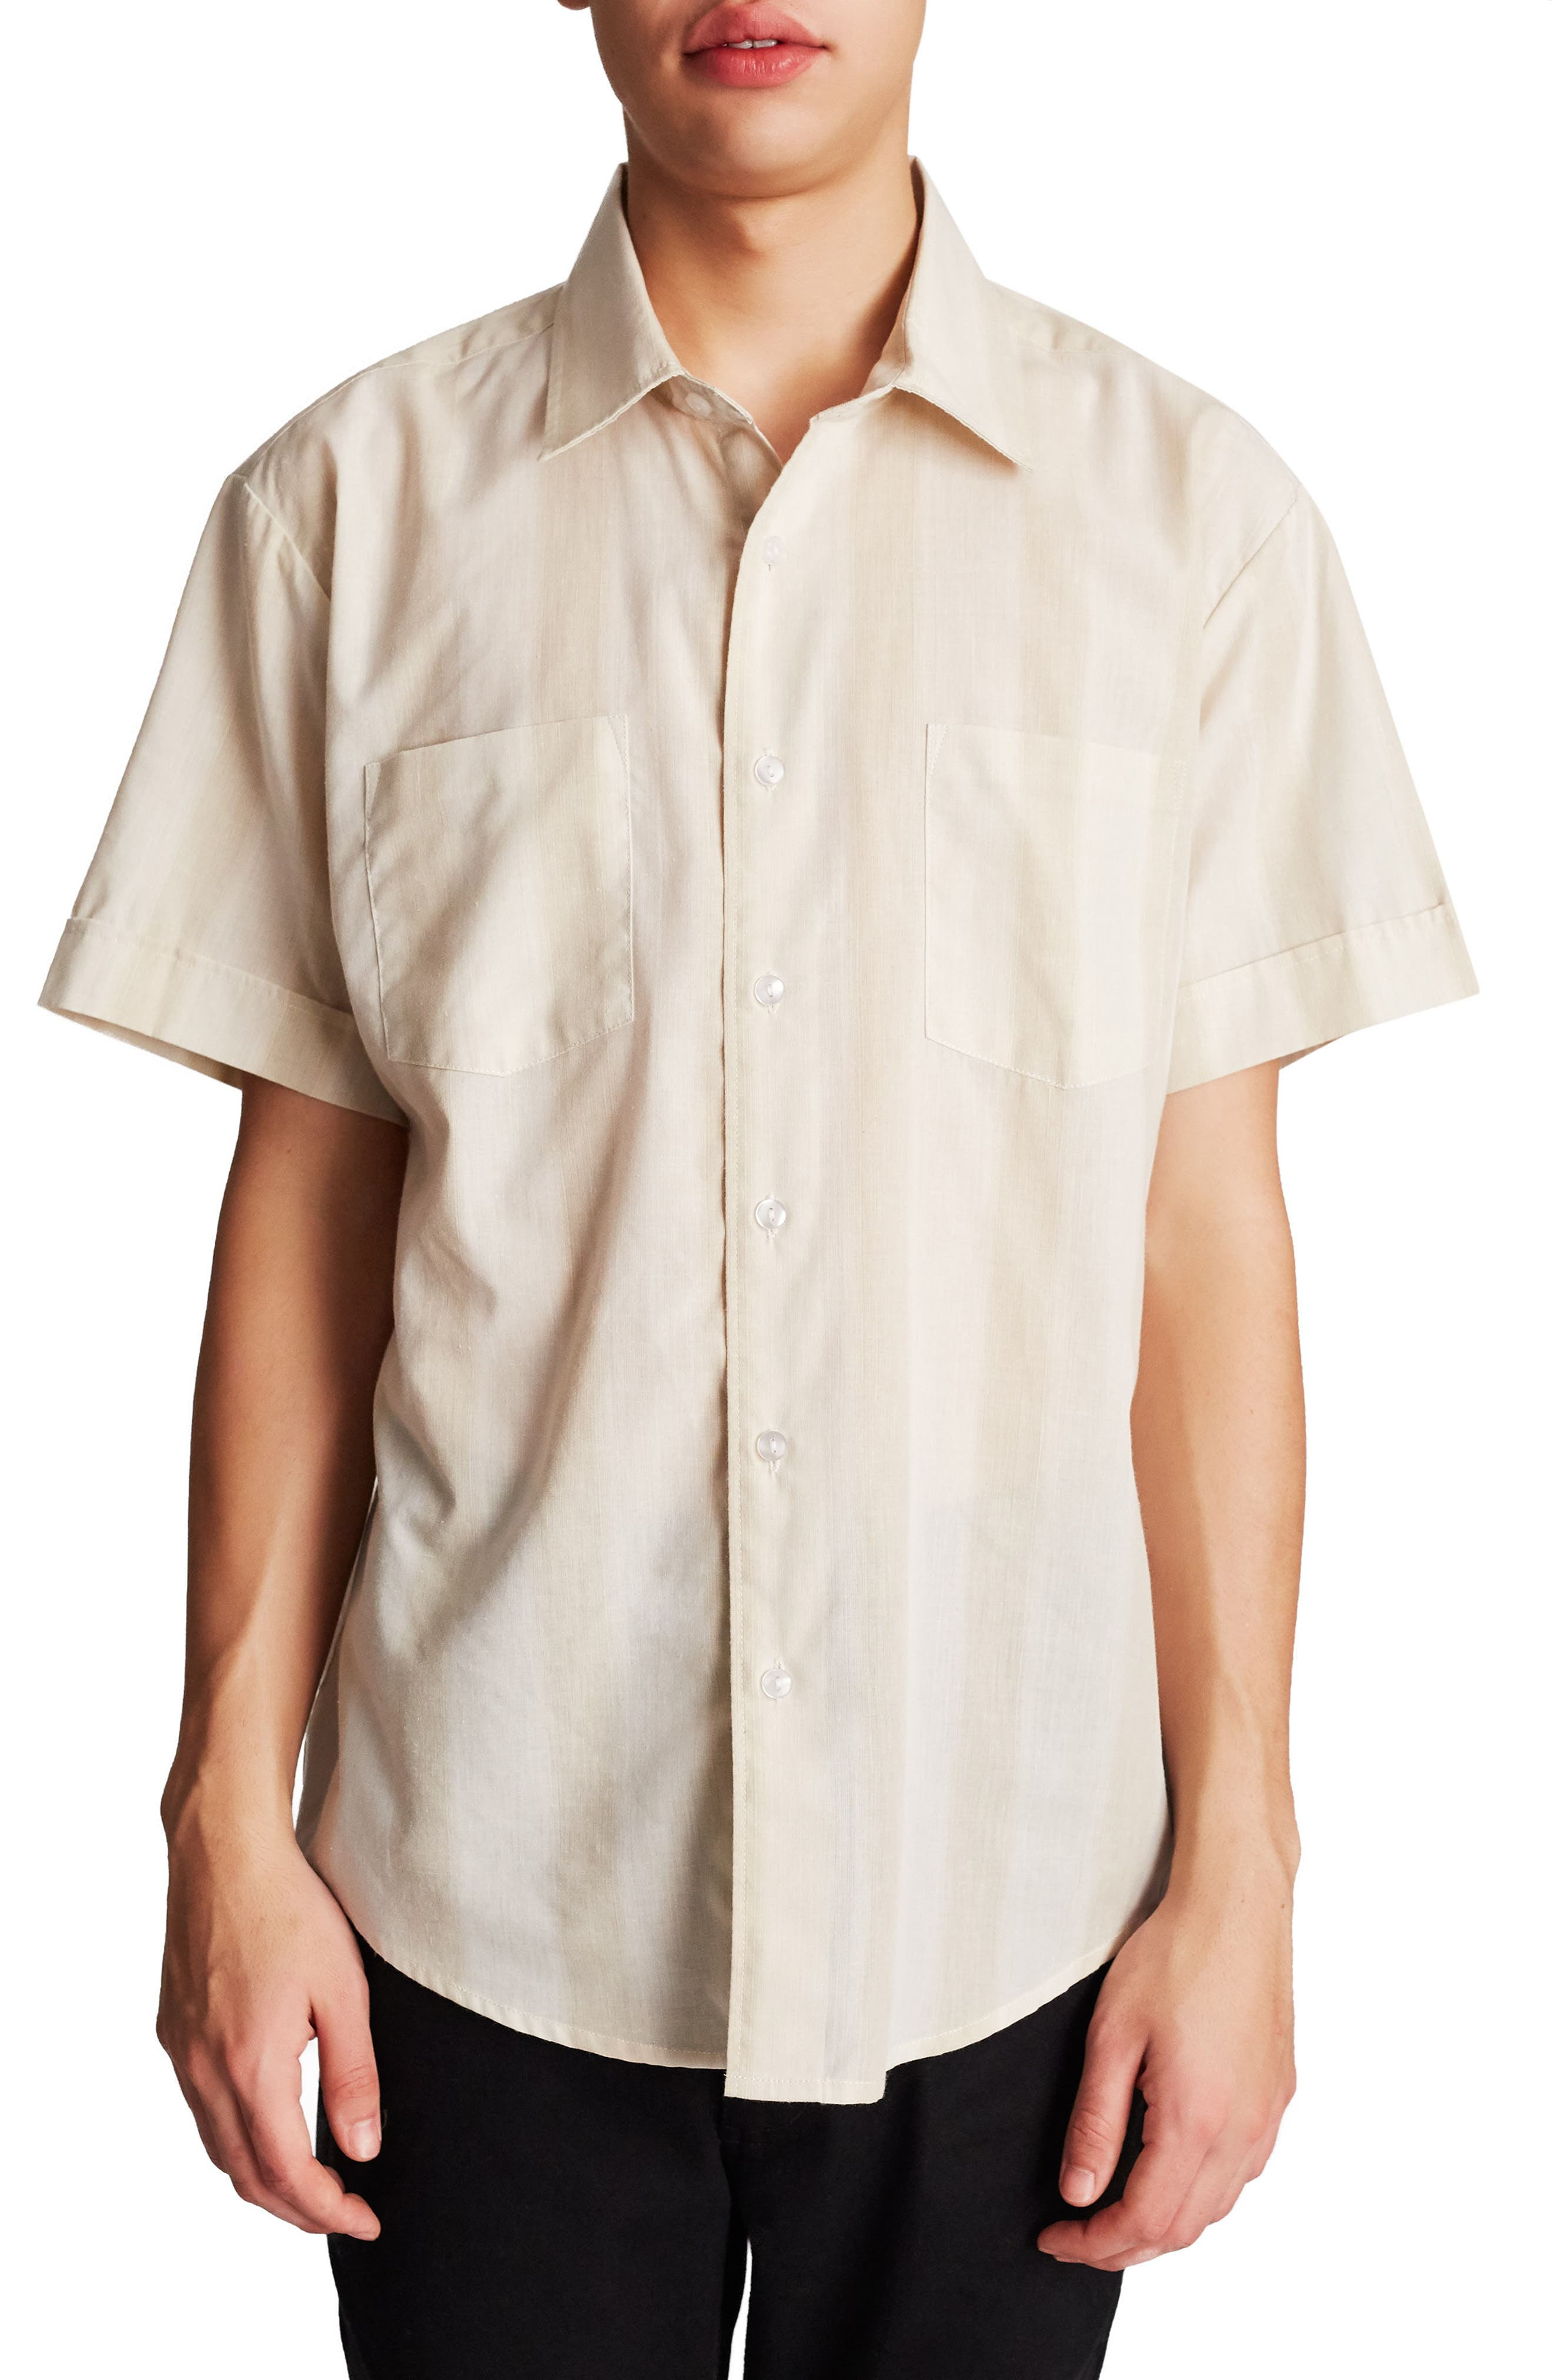 Branson Woven Shirt,                             Main thumbnail 1, color,                             050